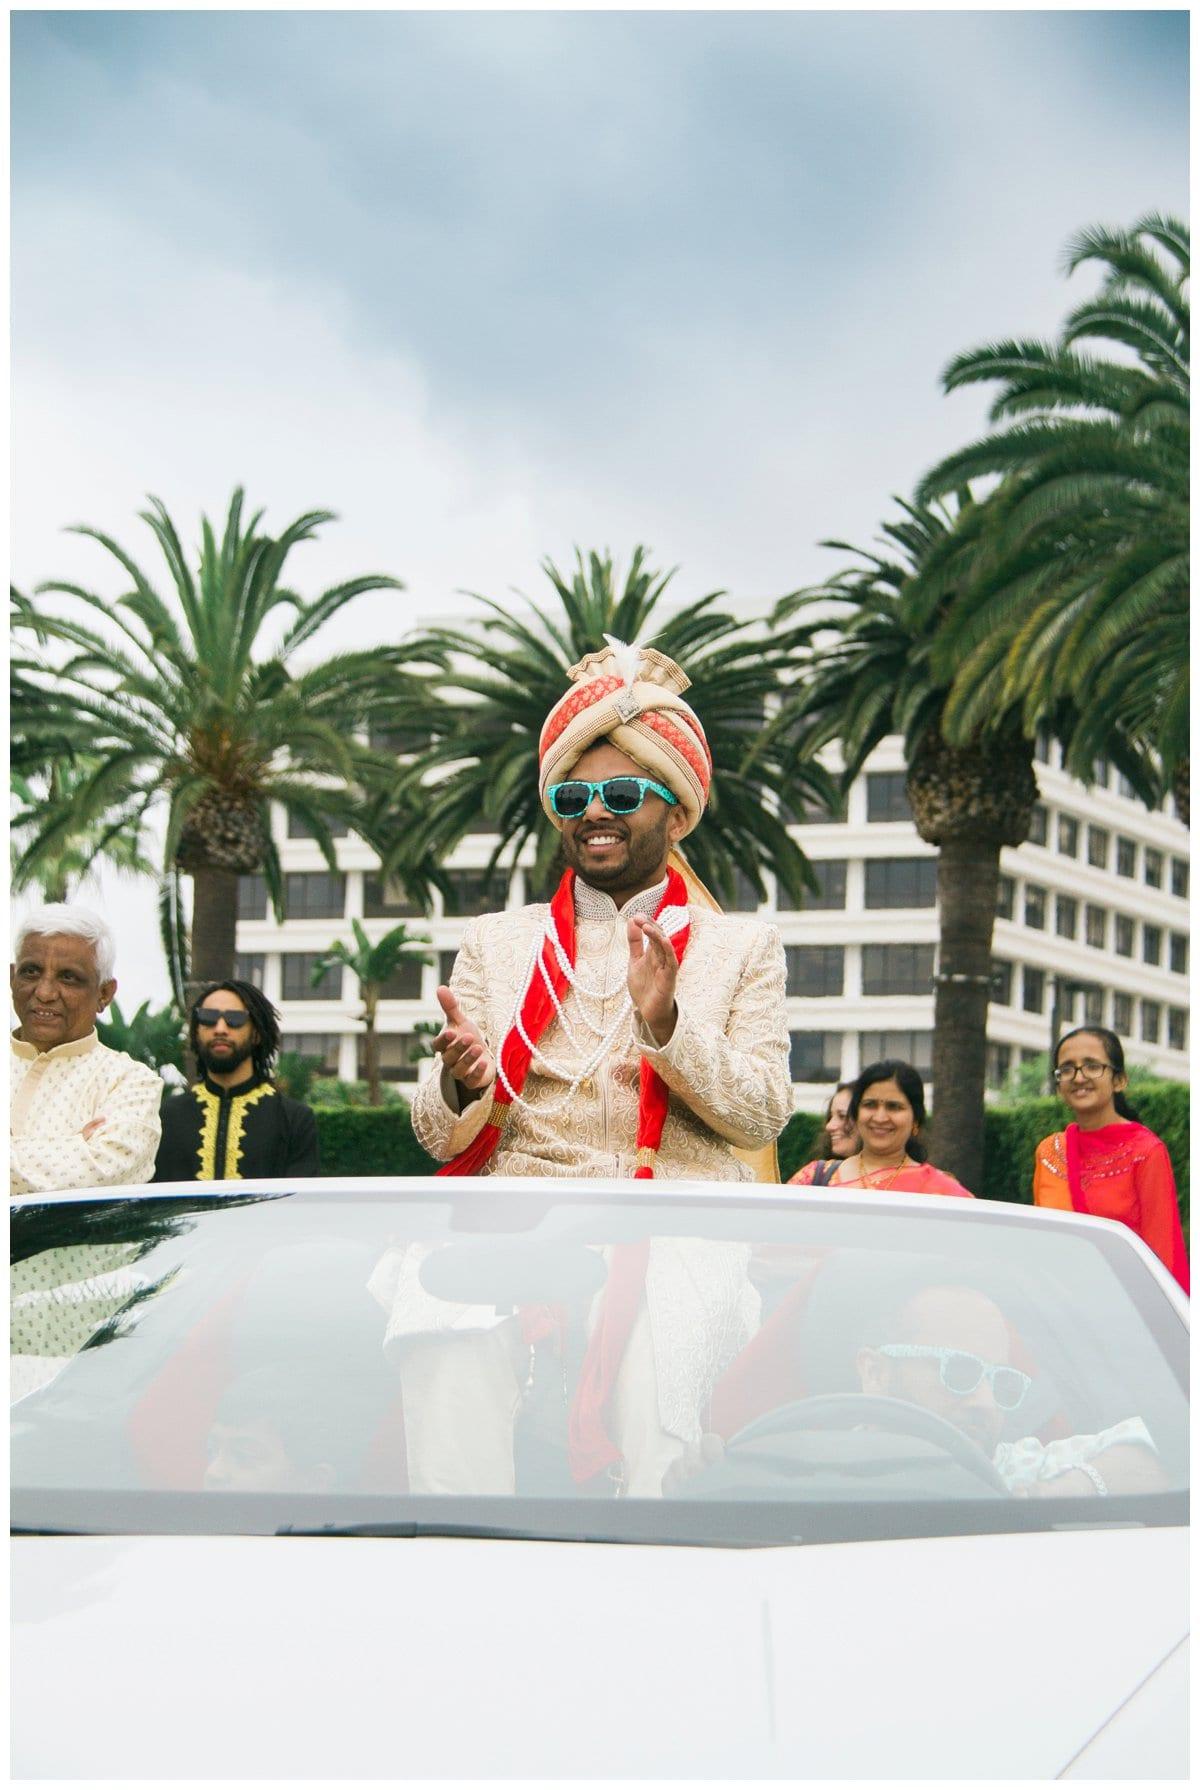 Hotel-Irvine-Indian-Wedding-Carissa-Woo-Photography_0062.jpg